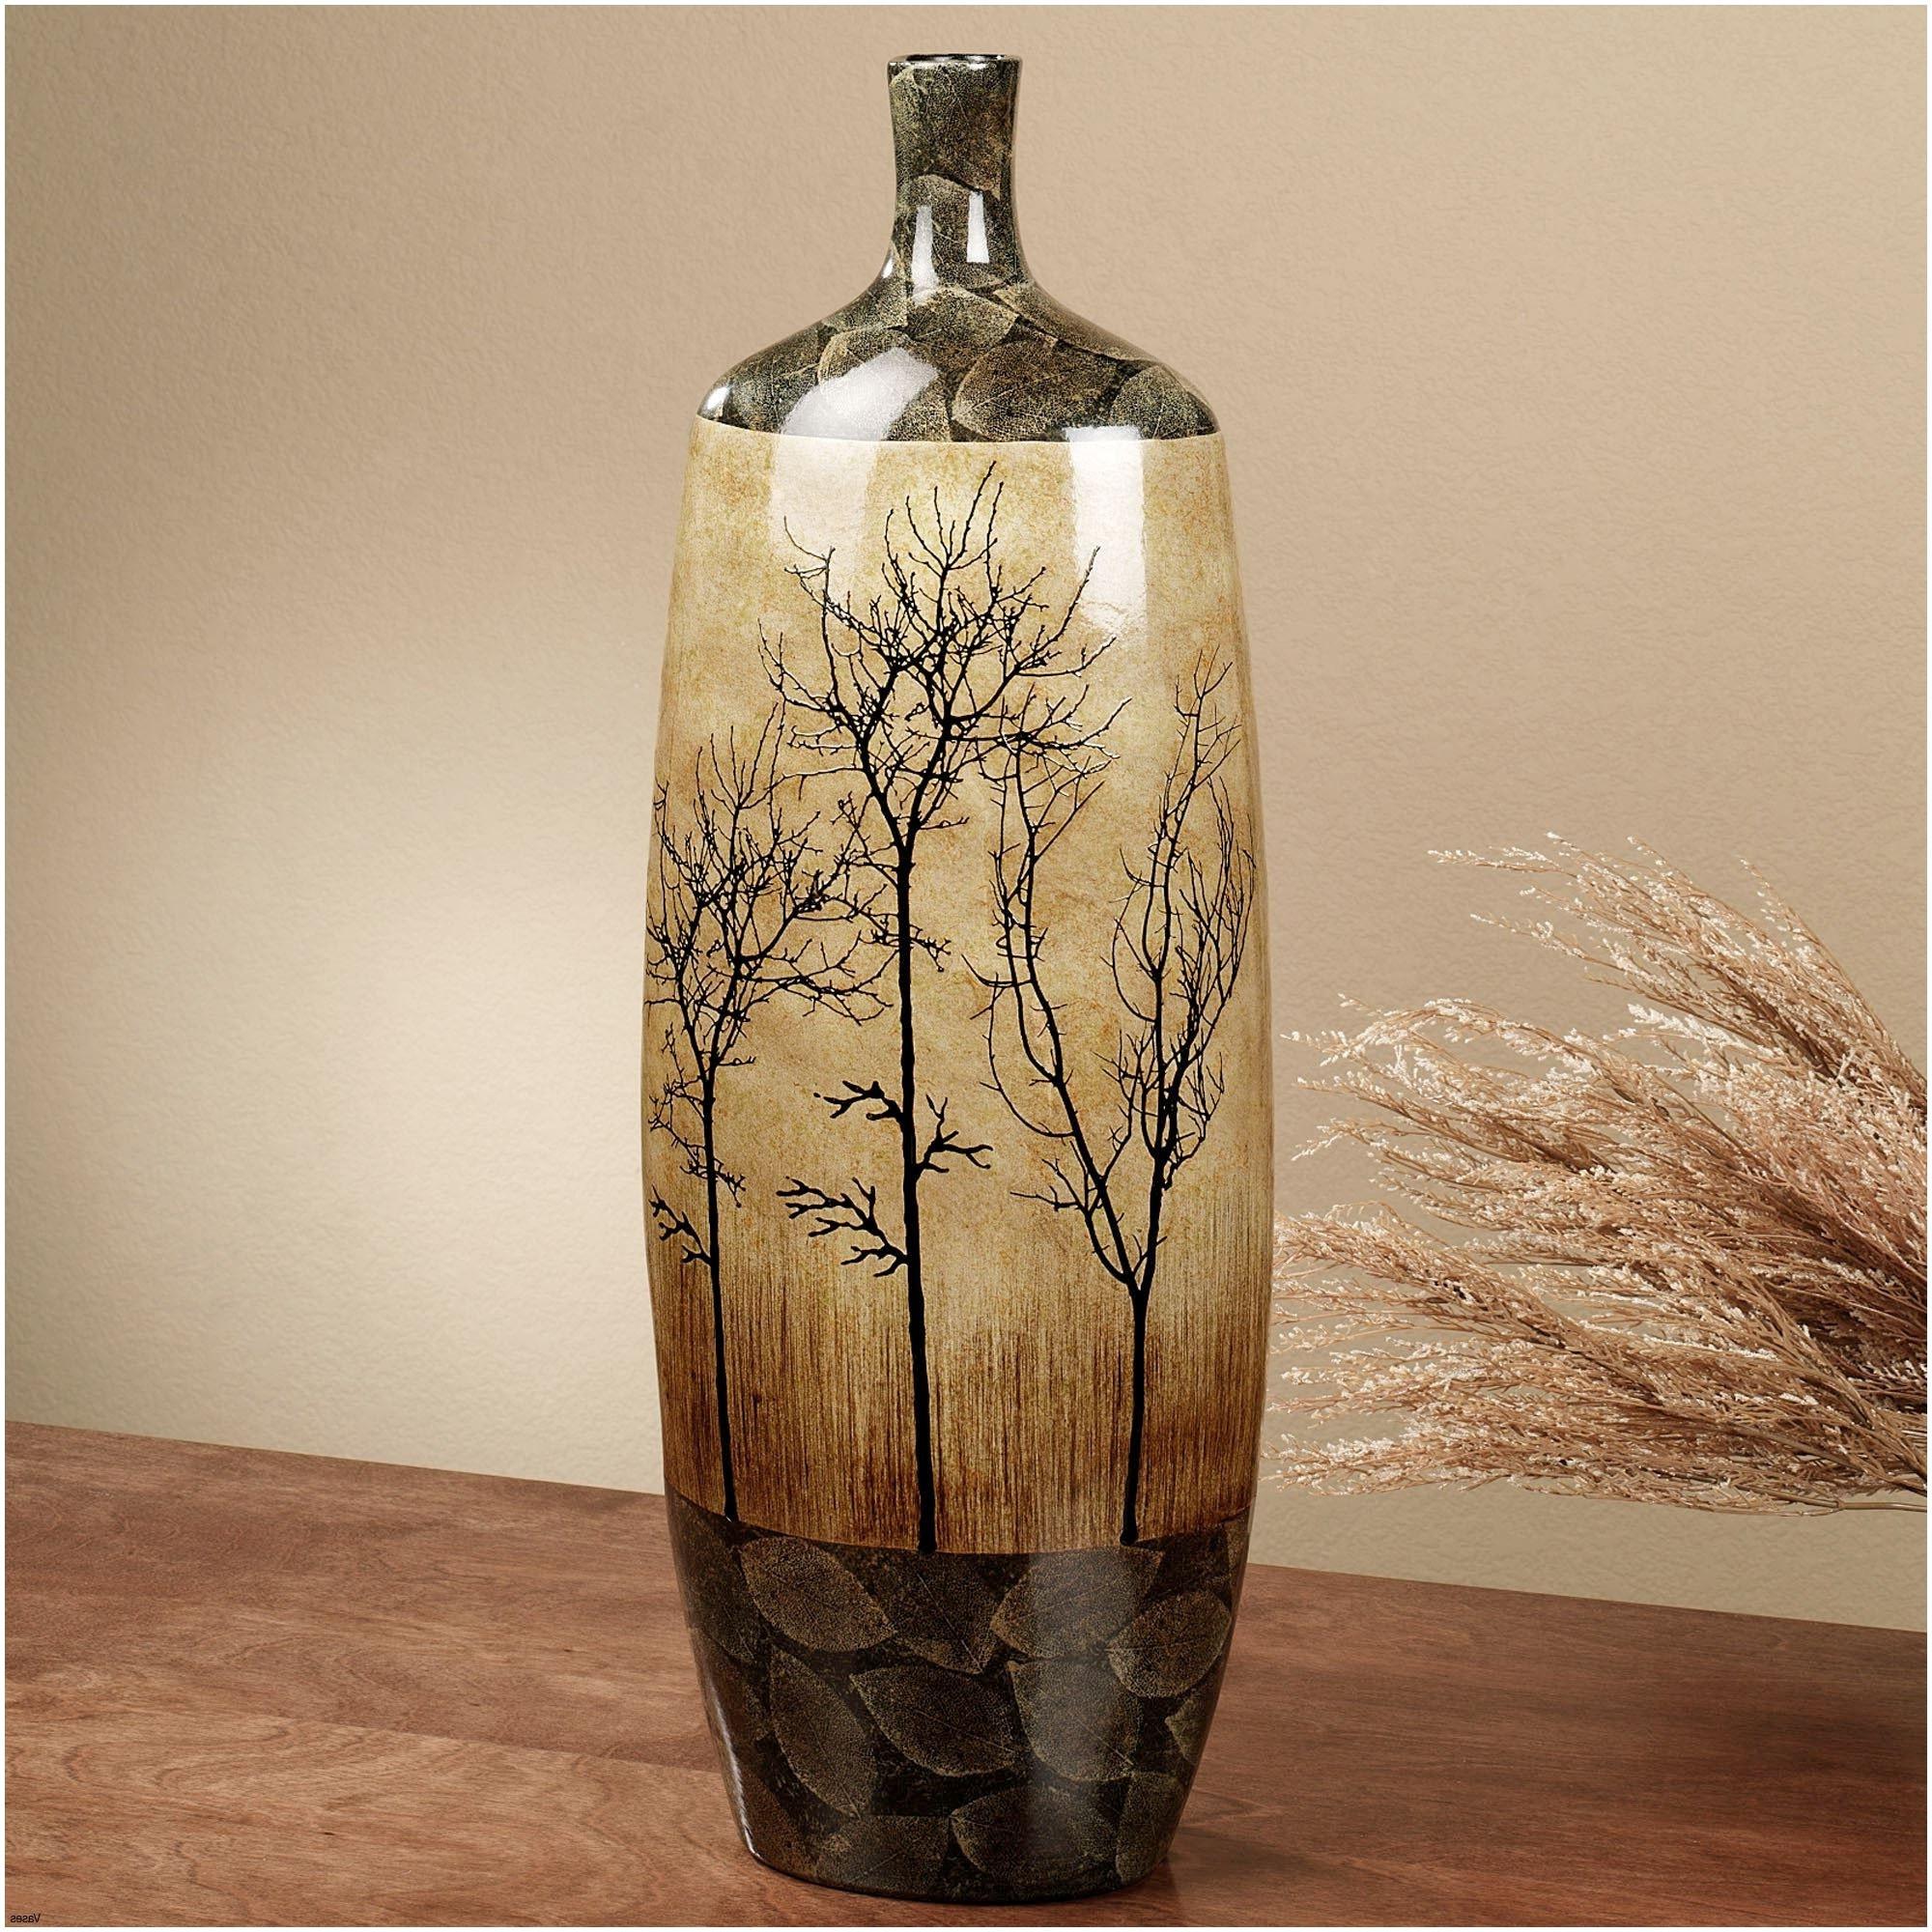 floor standing glass vase of 21 beau decorative vases anciendemutu org pertaining to c145 001h vases ceramic decorative to expandi 0d